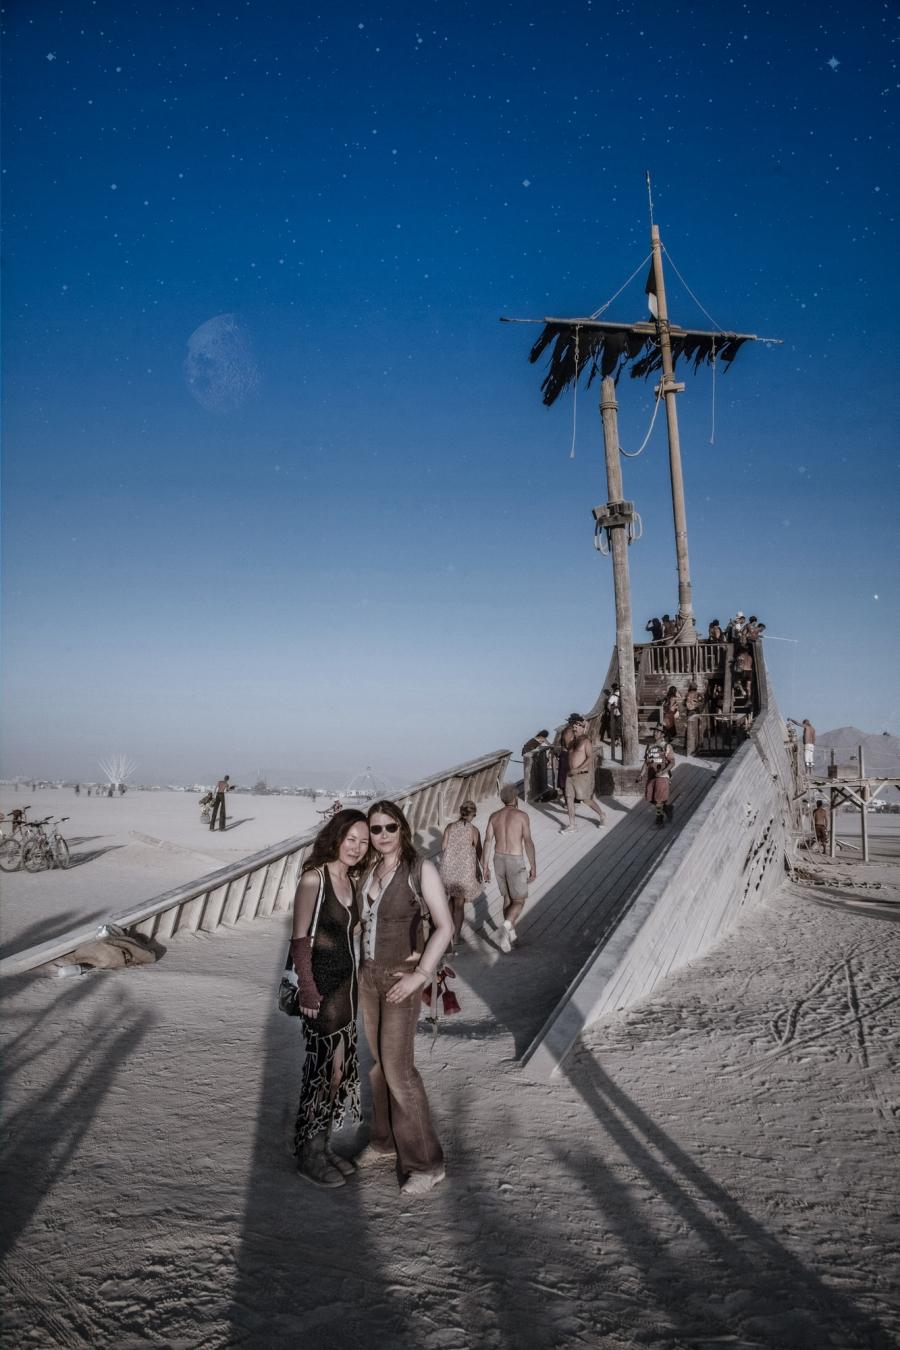 Portrait at Pier 2 - The Derelict, Burning Man 2012